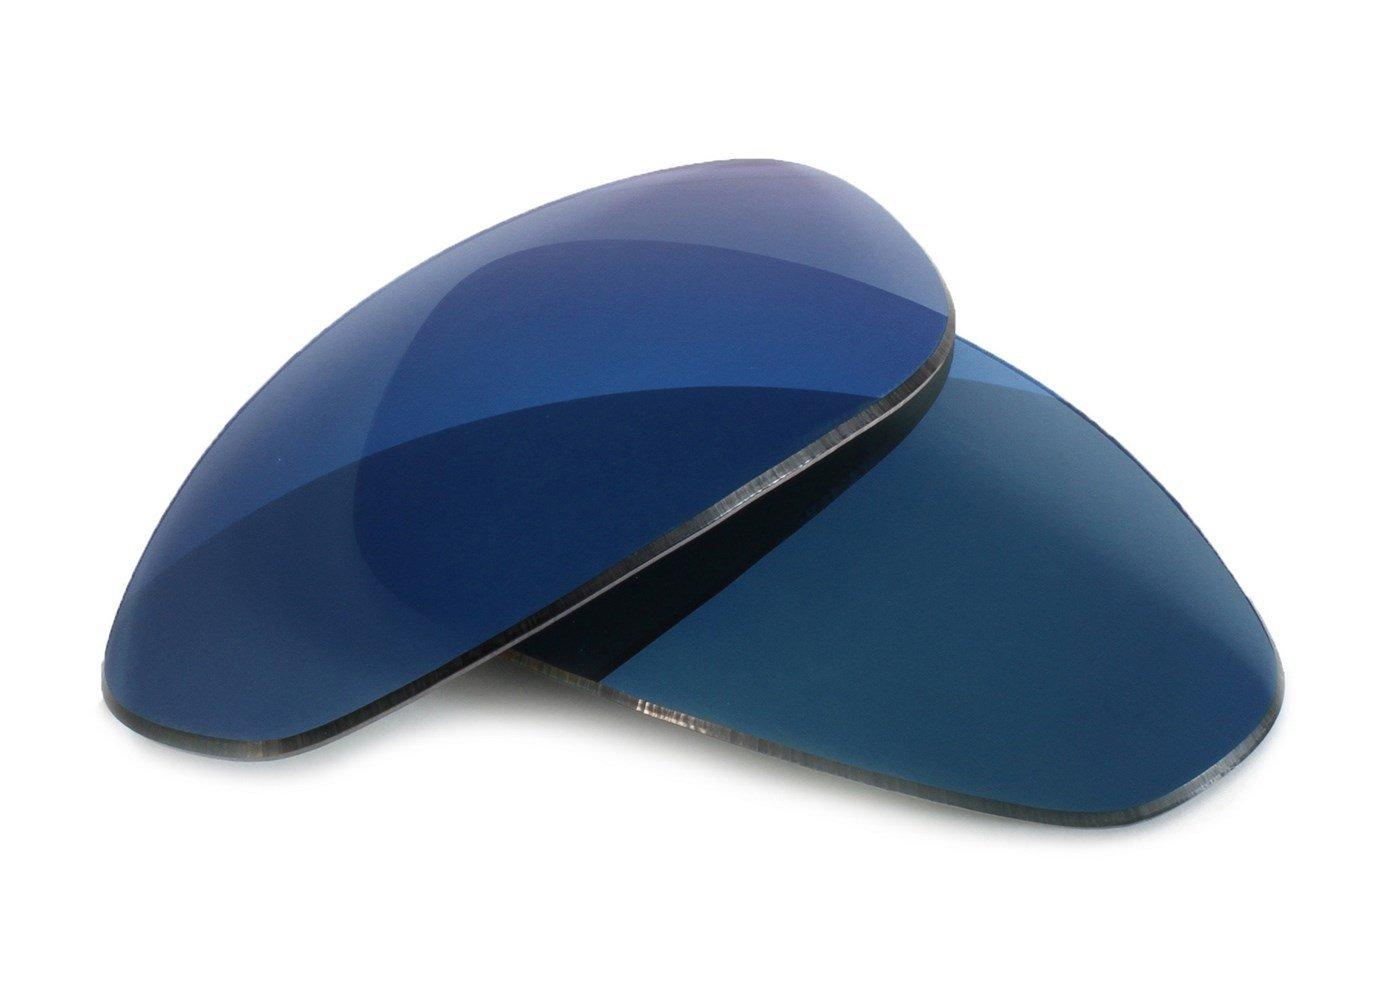 Fuse Lenses for Oakley Topcoat - Midnight Blue Mirror Tint